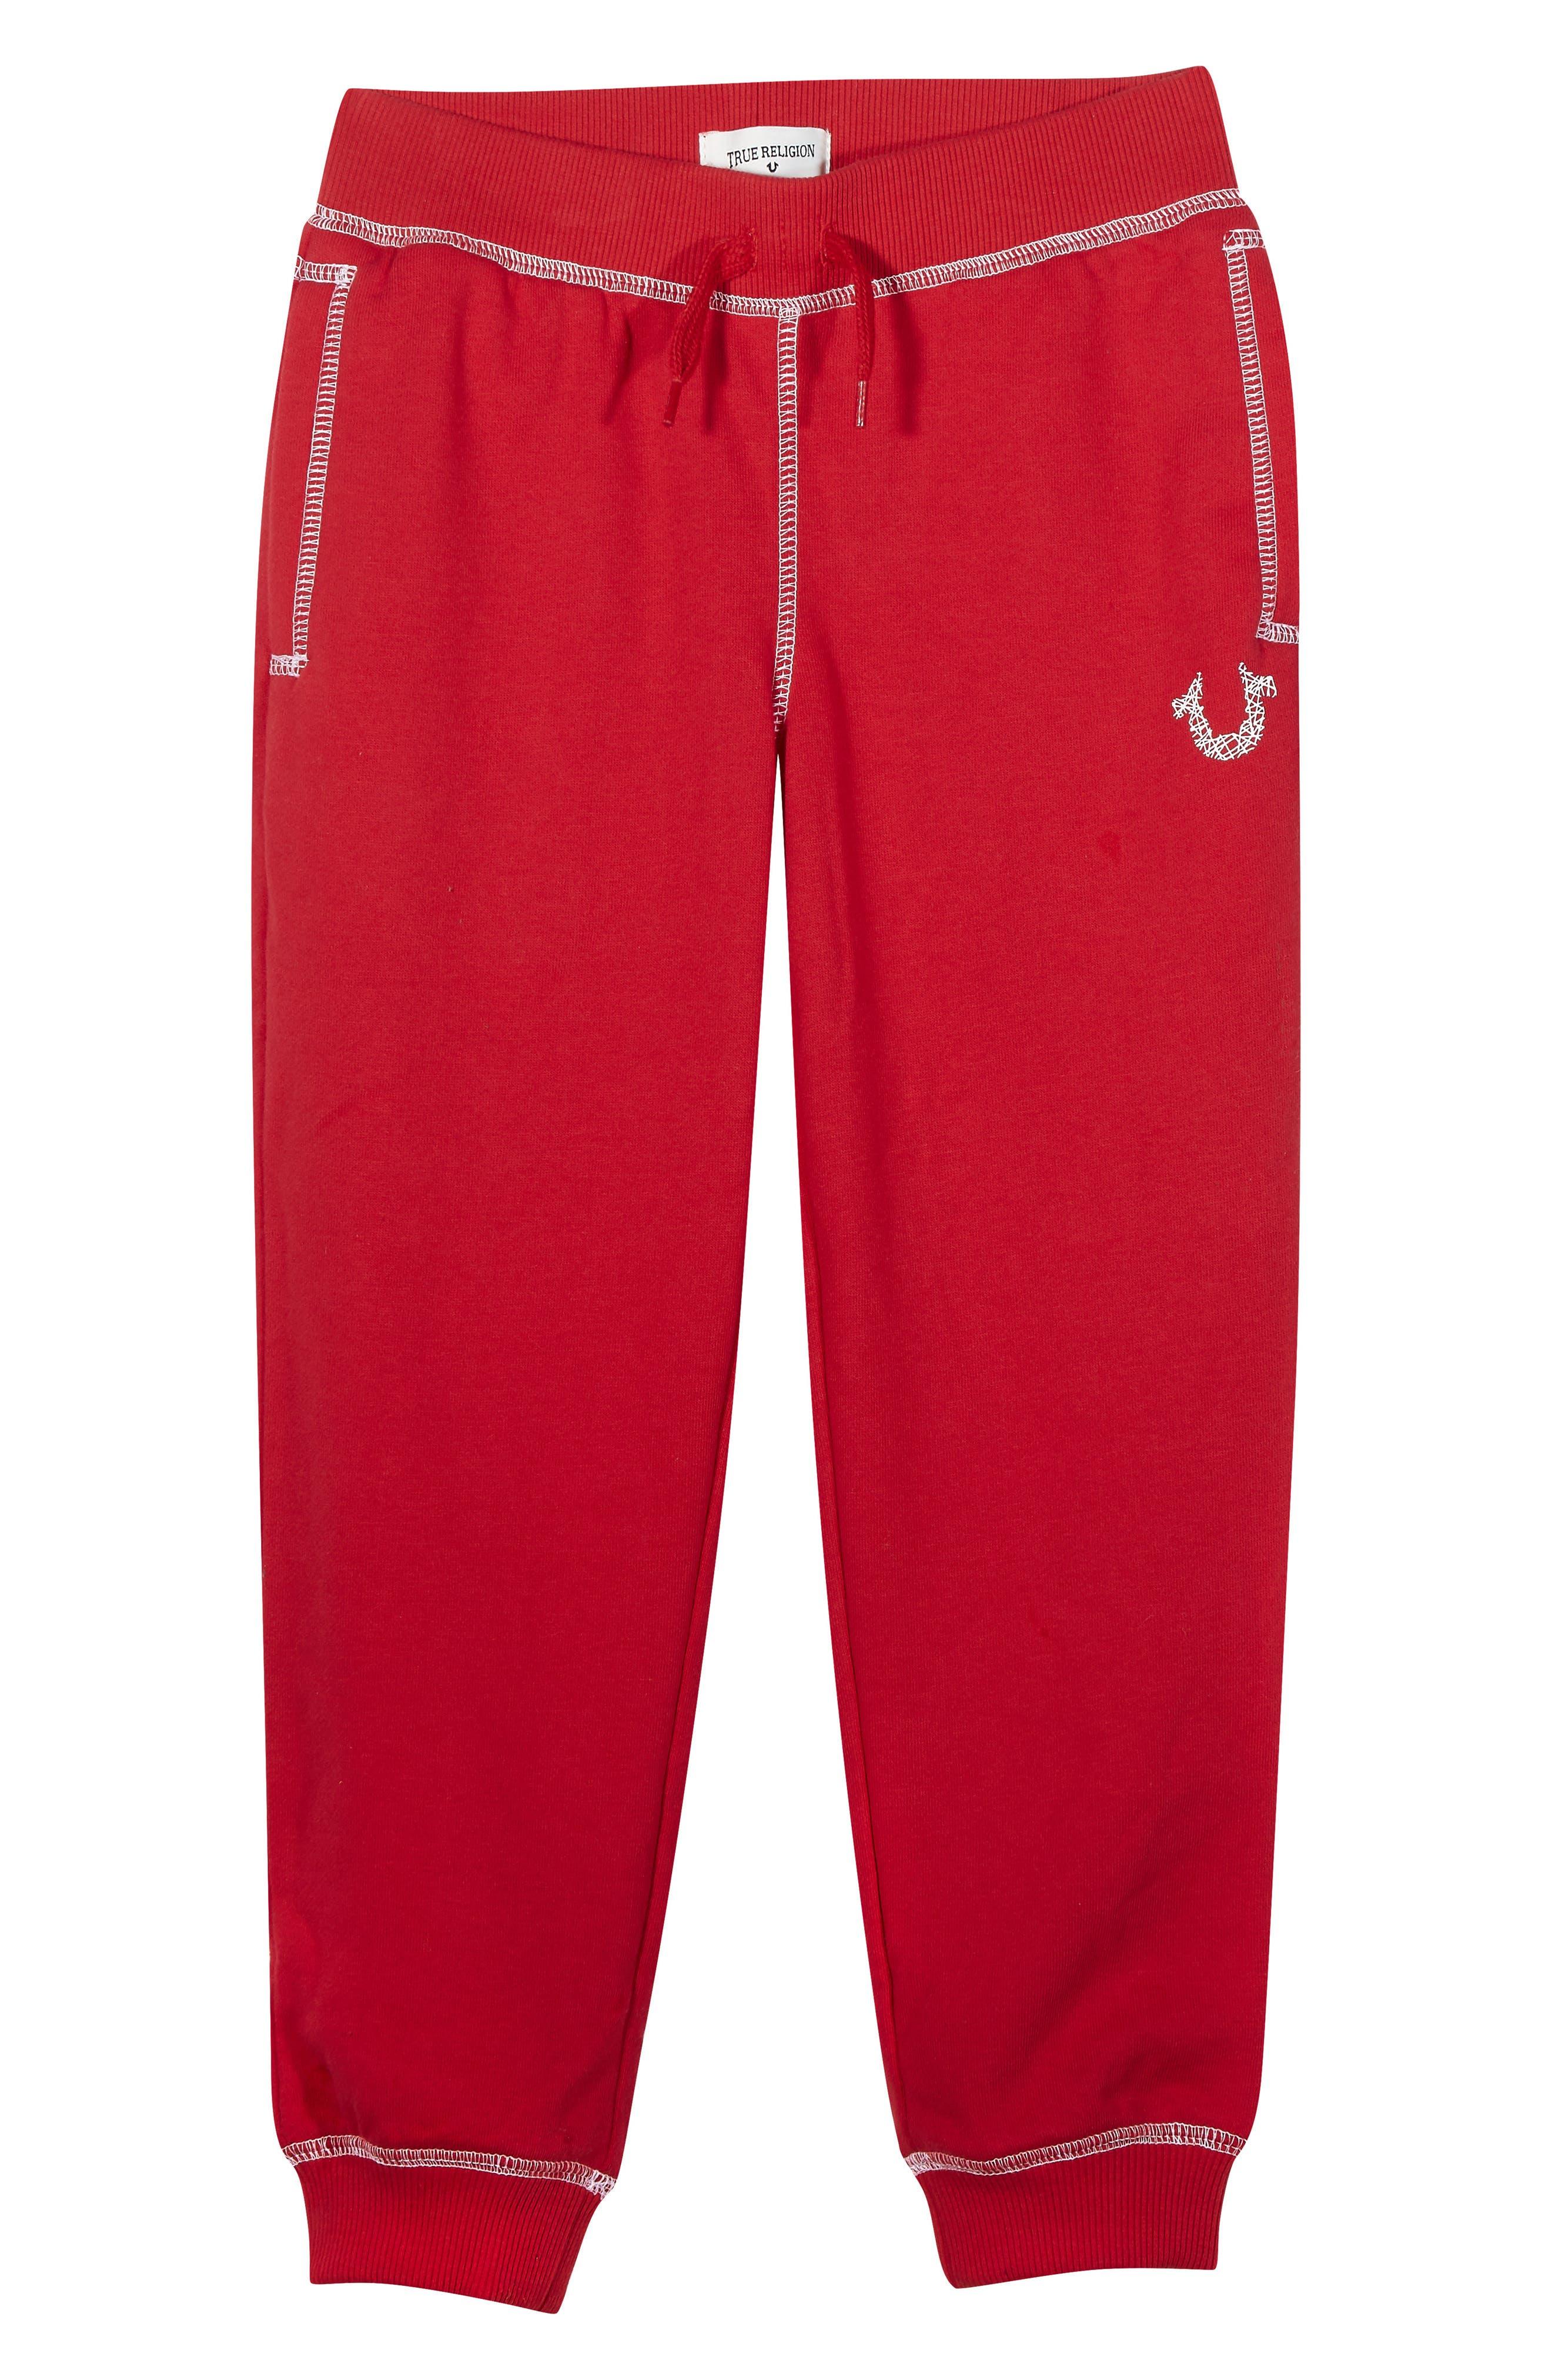 Shoestring Sweatpants,                             Main thumbnail 1, color,                             Bright Red